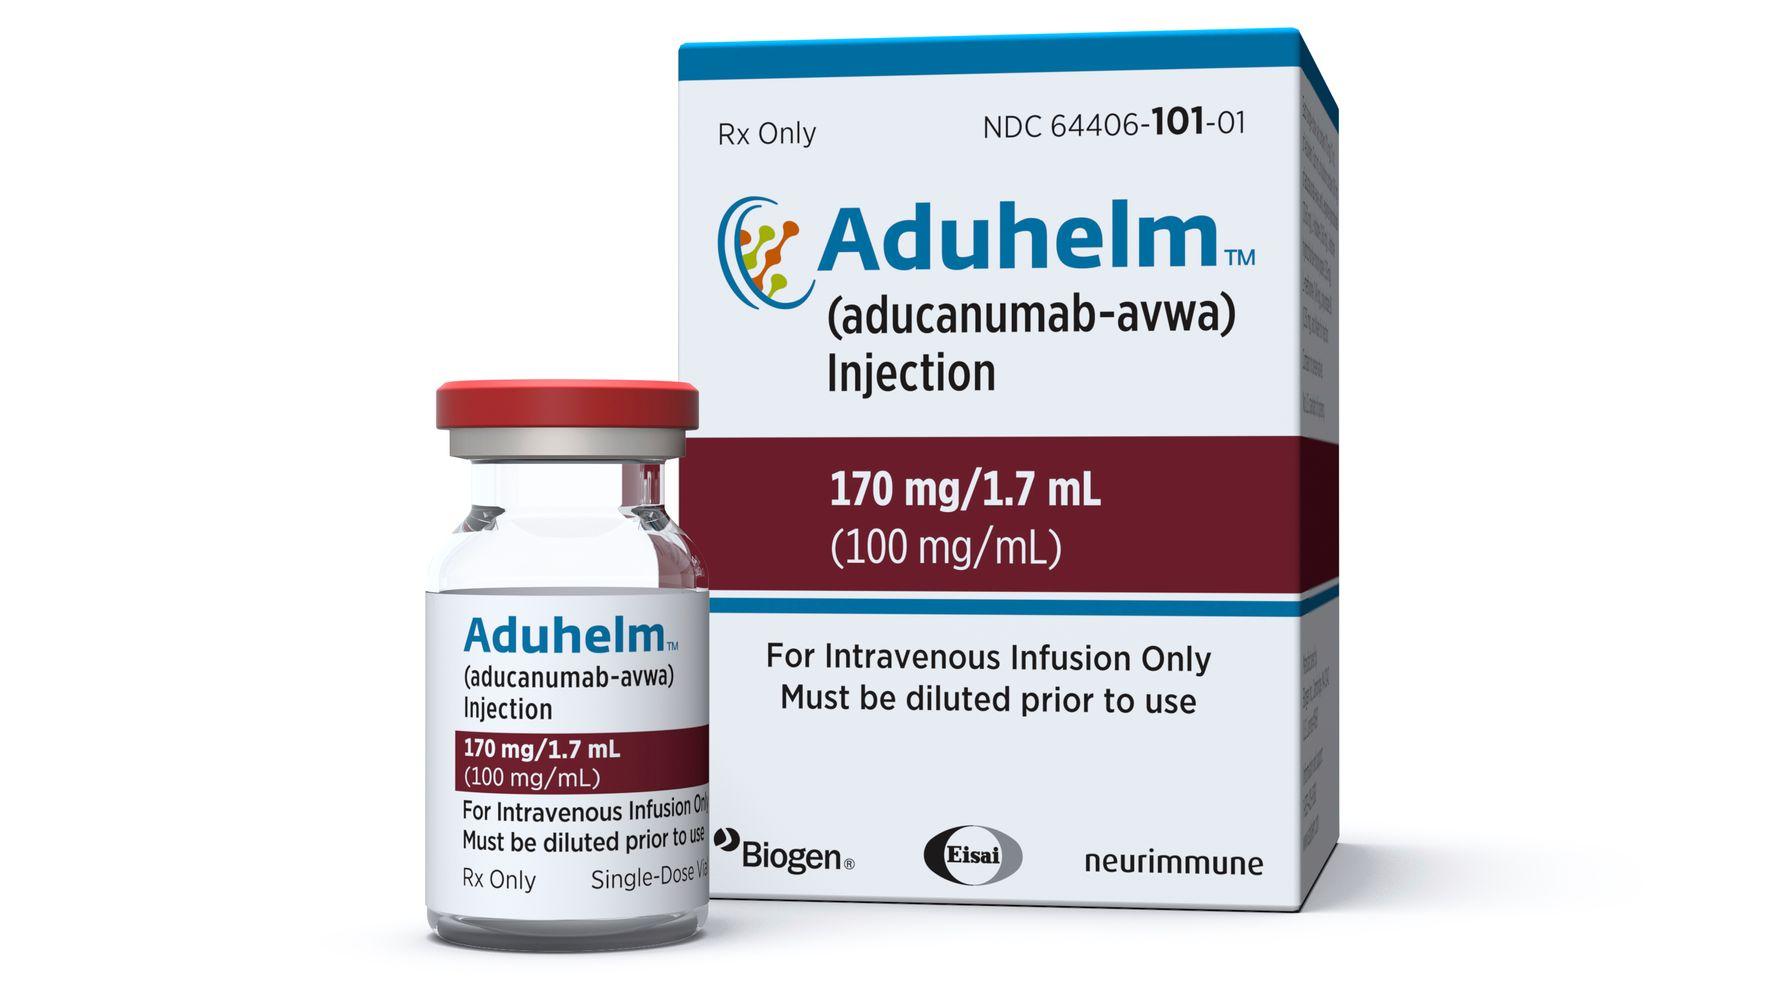 FDA Adviser Quits Over 'Probably The Worst' Approval Decision Of Alzheimer's Drug